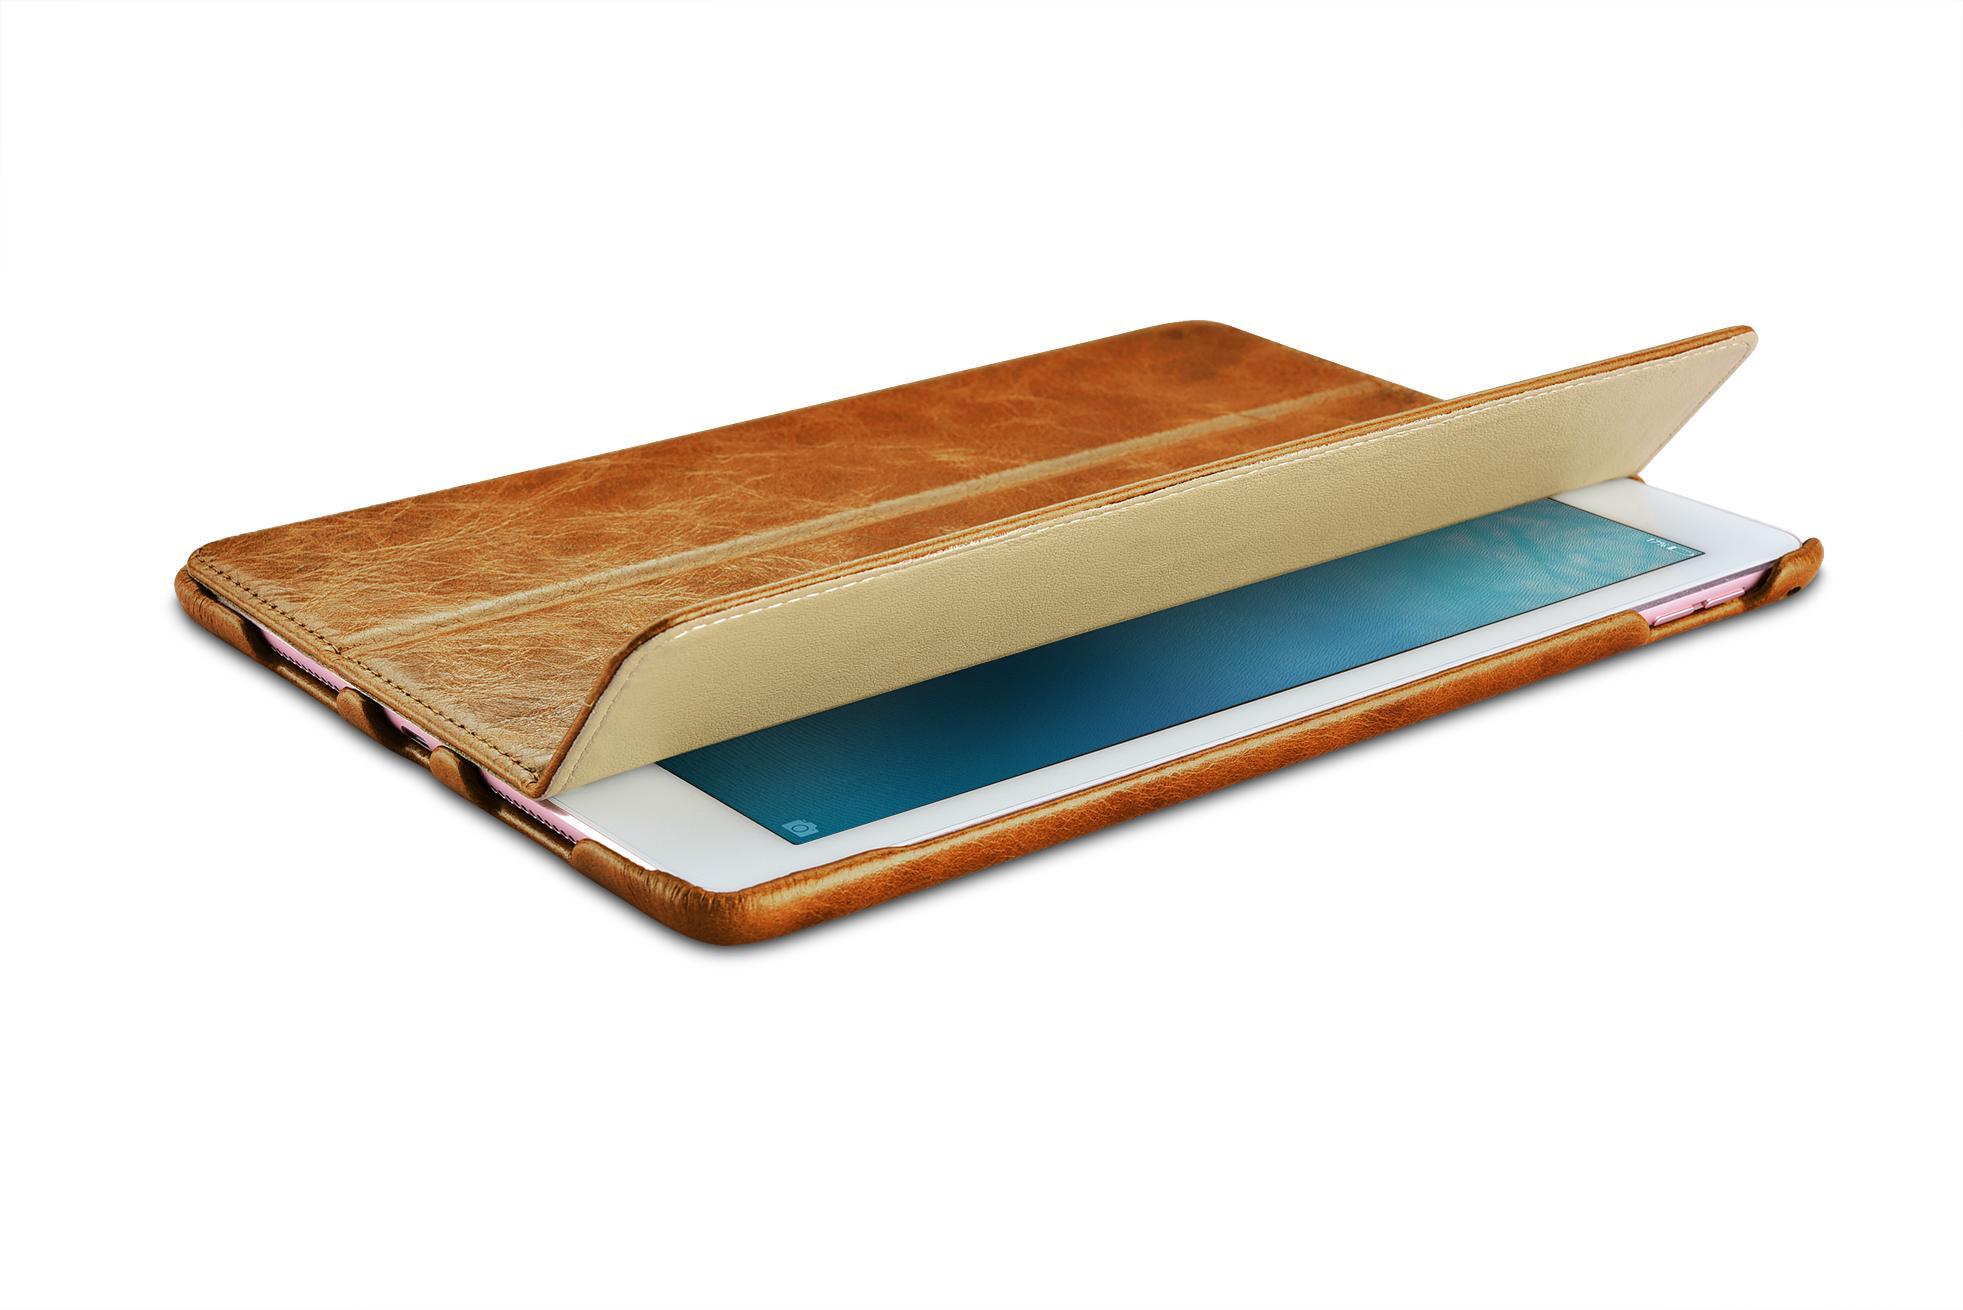 iCarer iPad Pro 9.7 inch Oil Wax Vintage Genuine Leather Folio Case 6